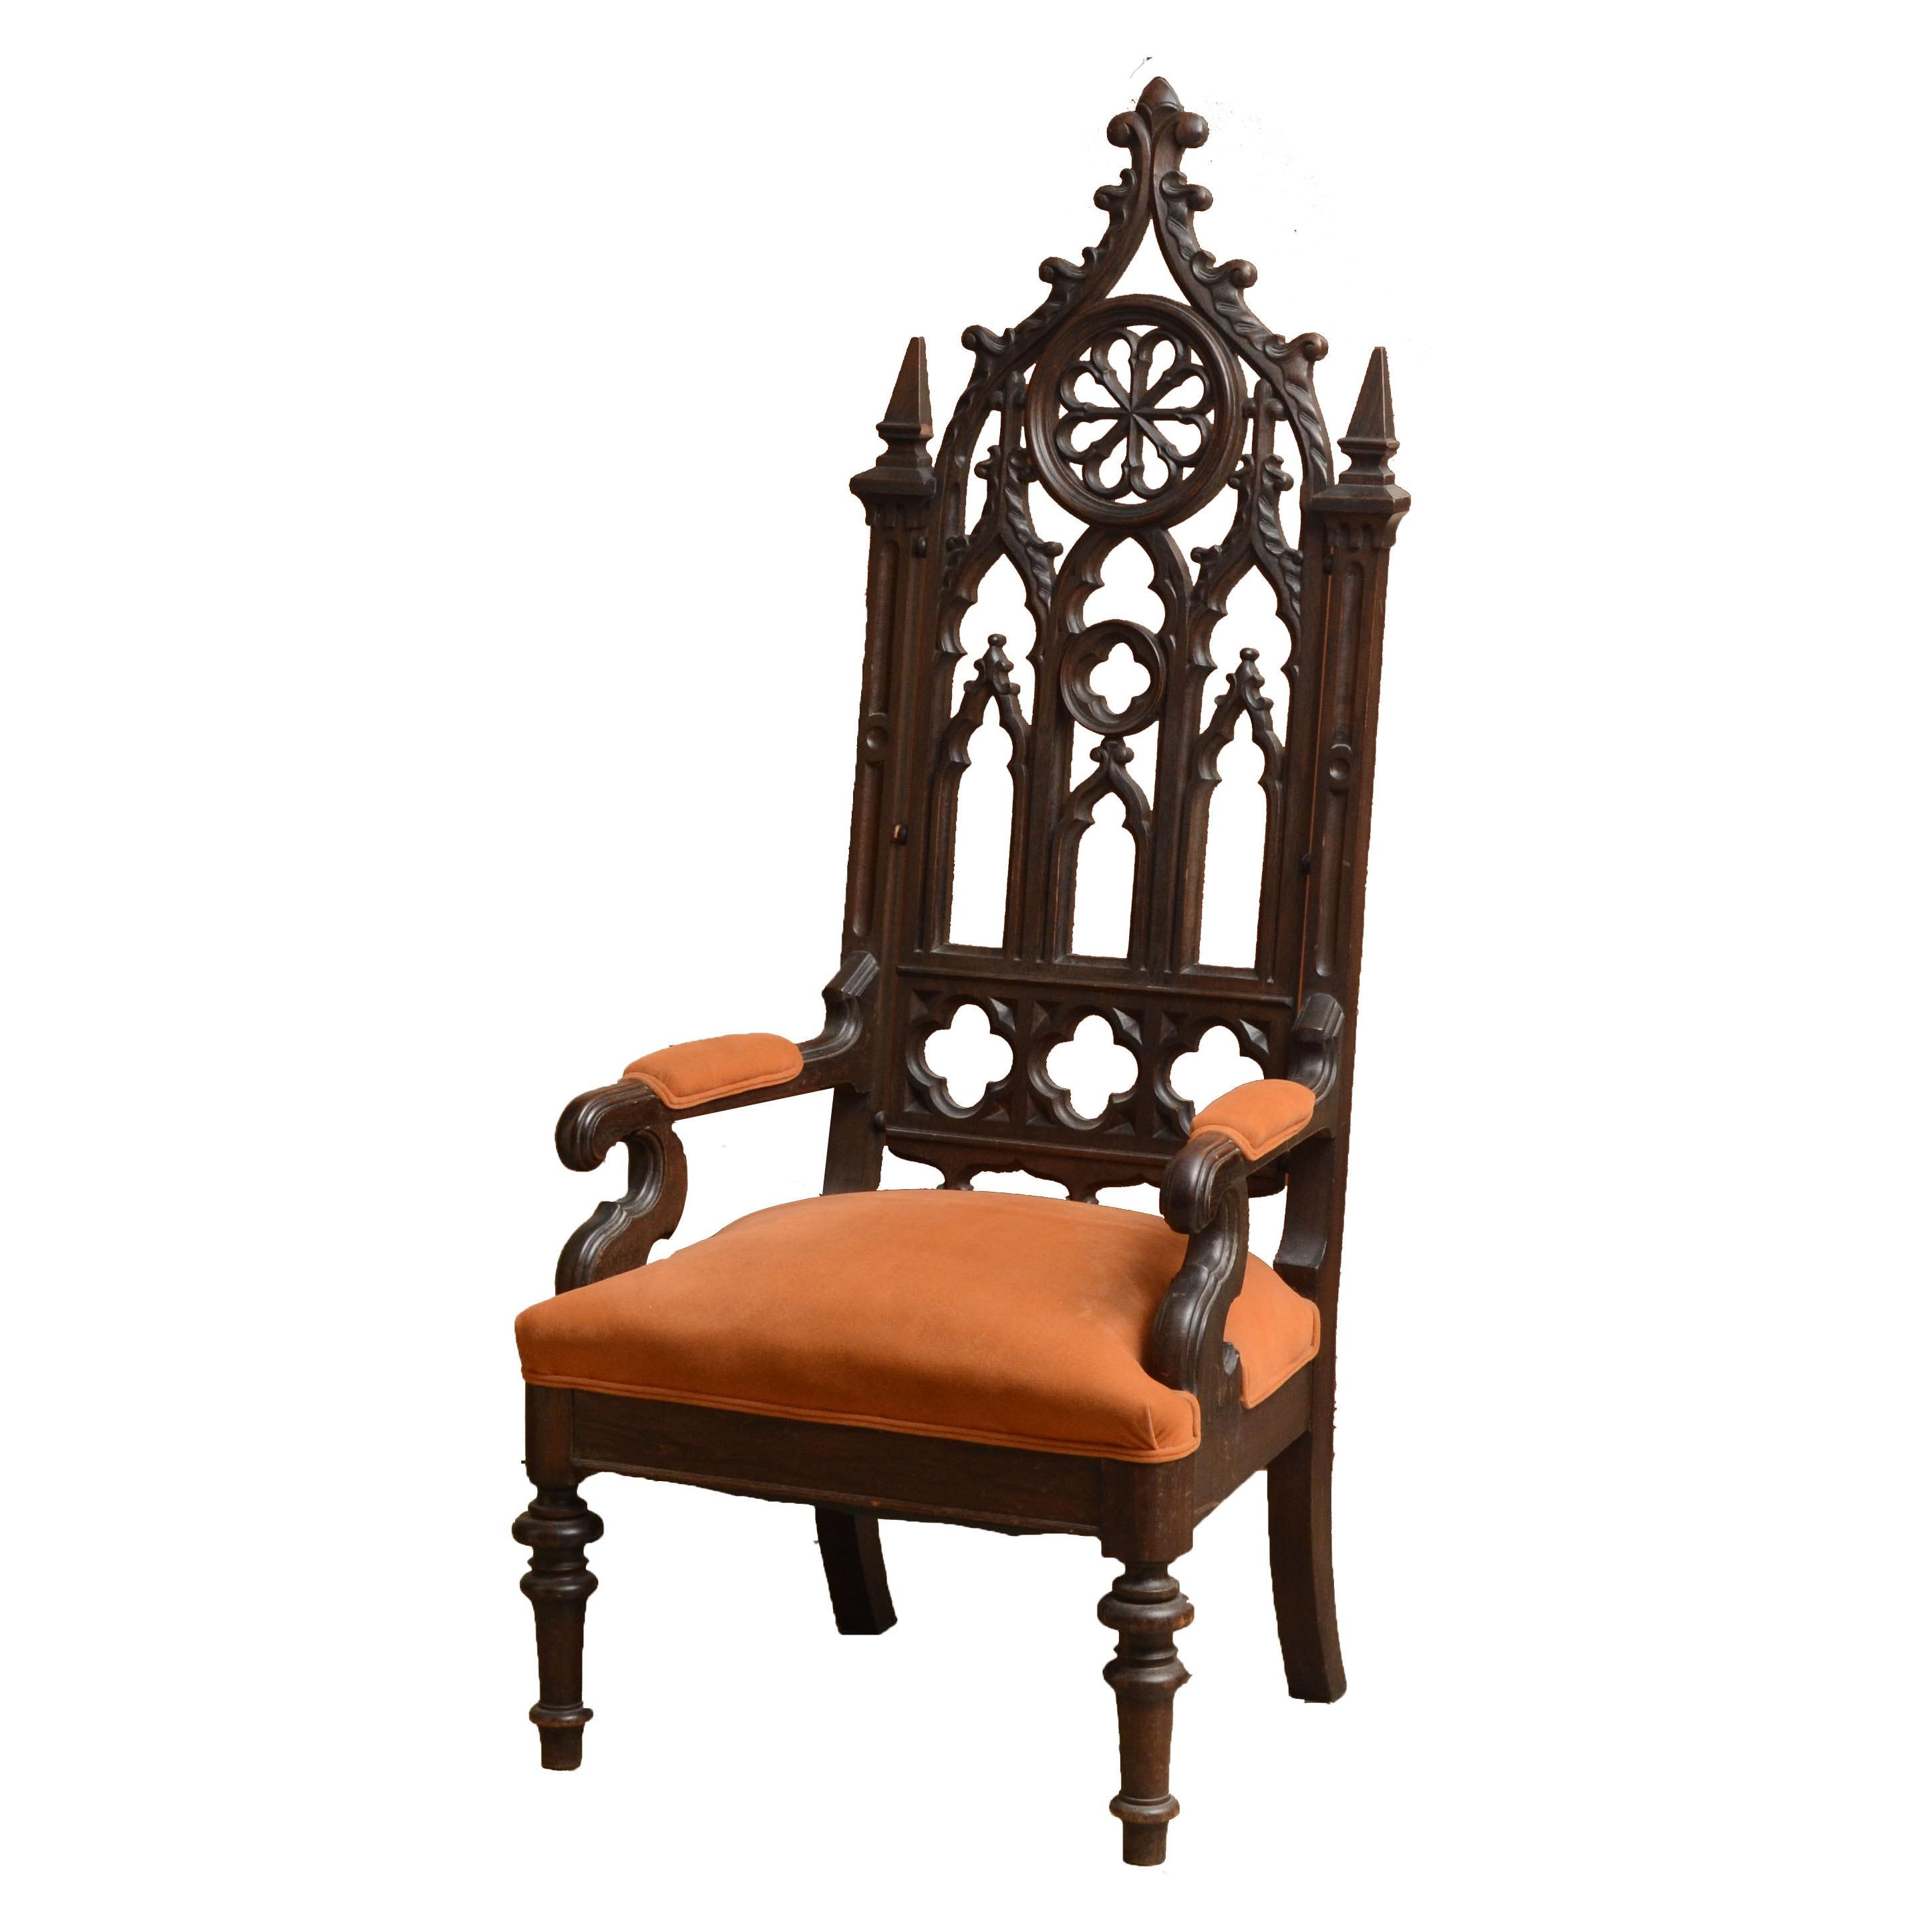 19th Century Gothic Revival Arm Chair